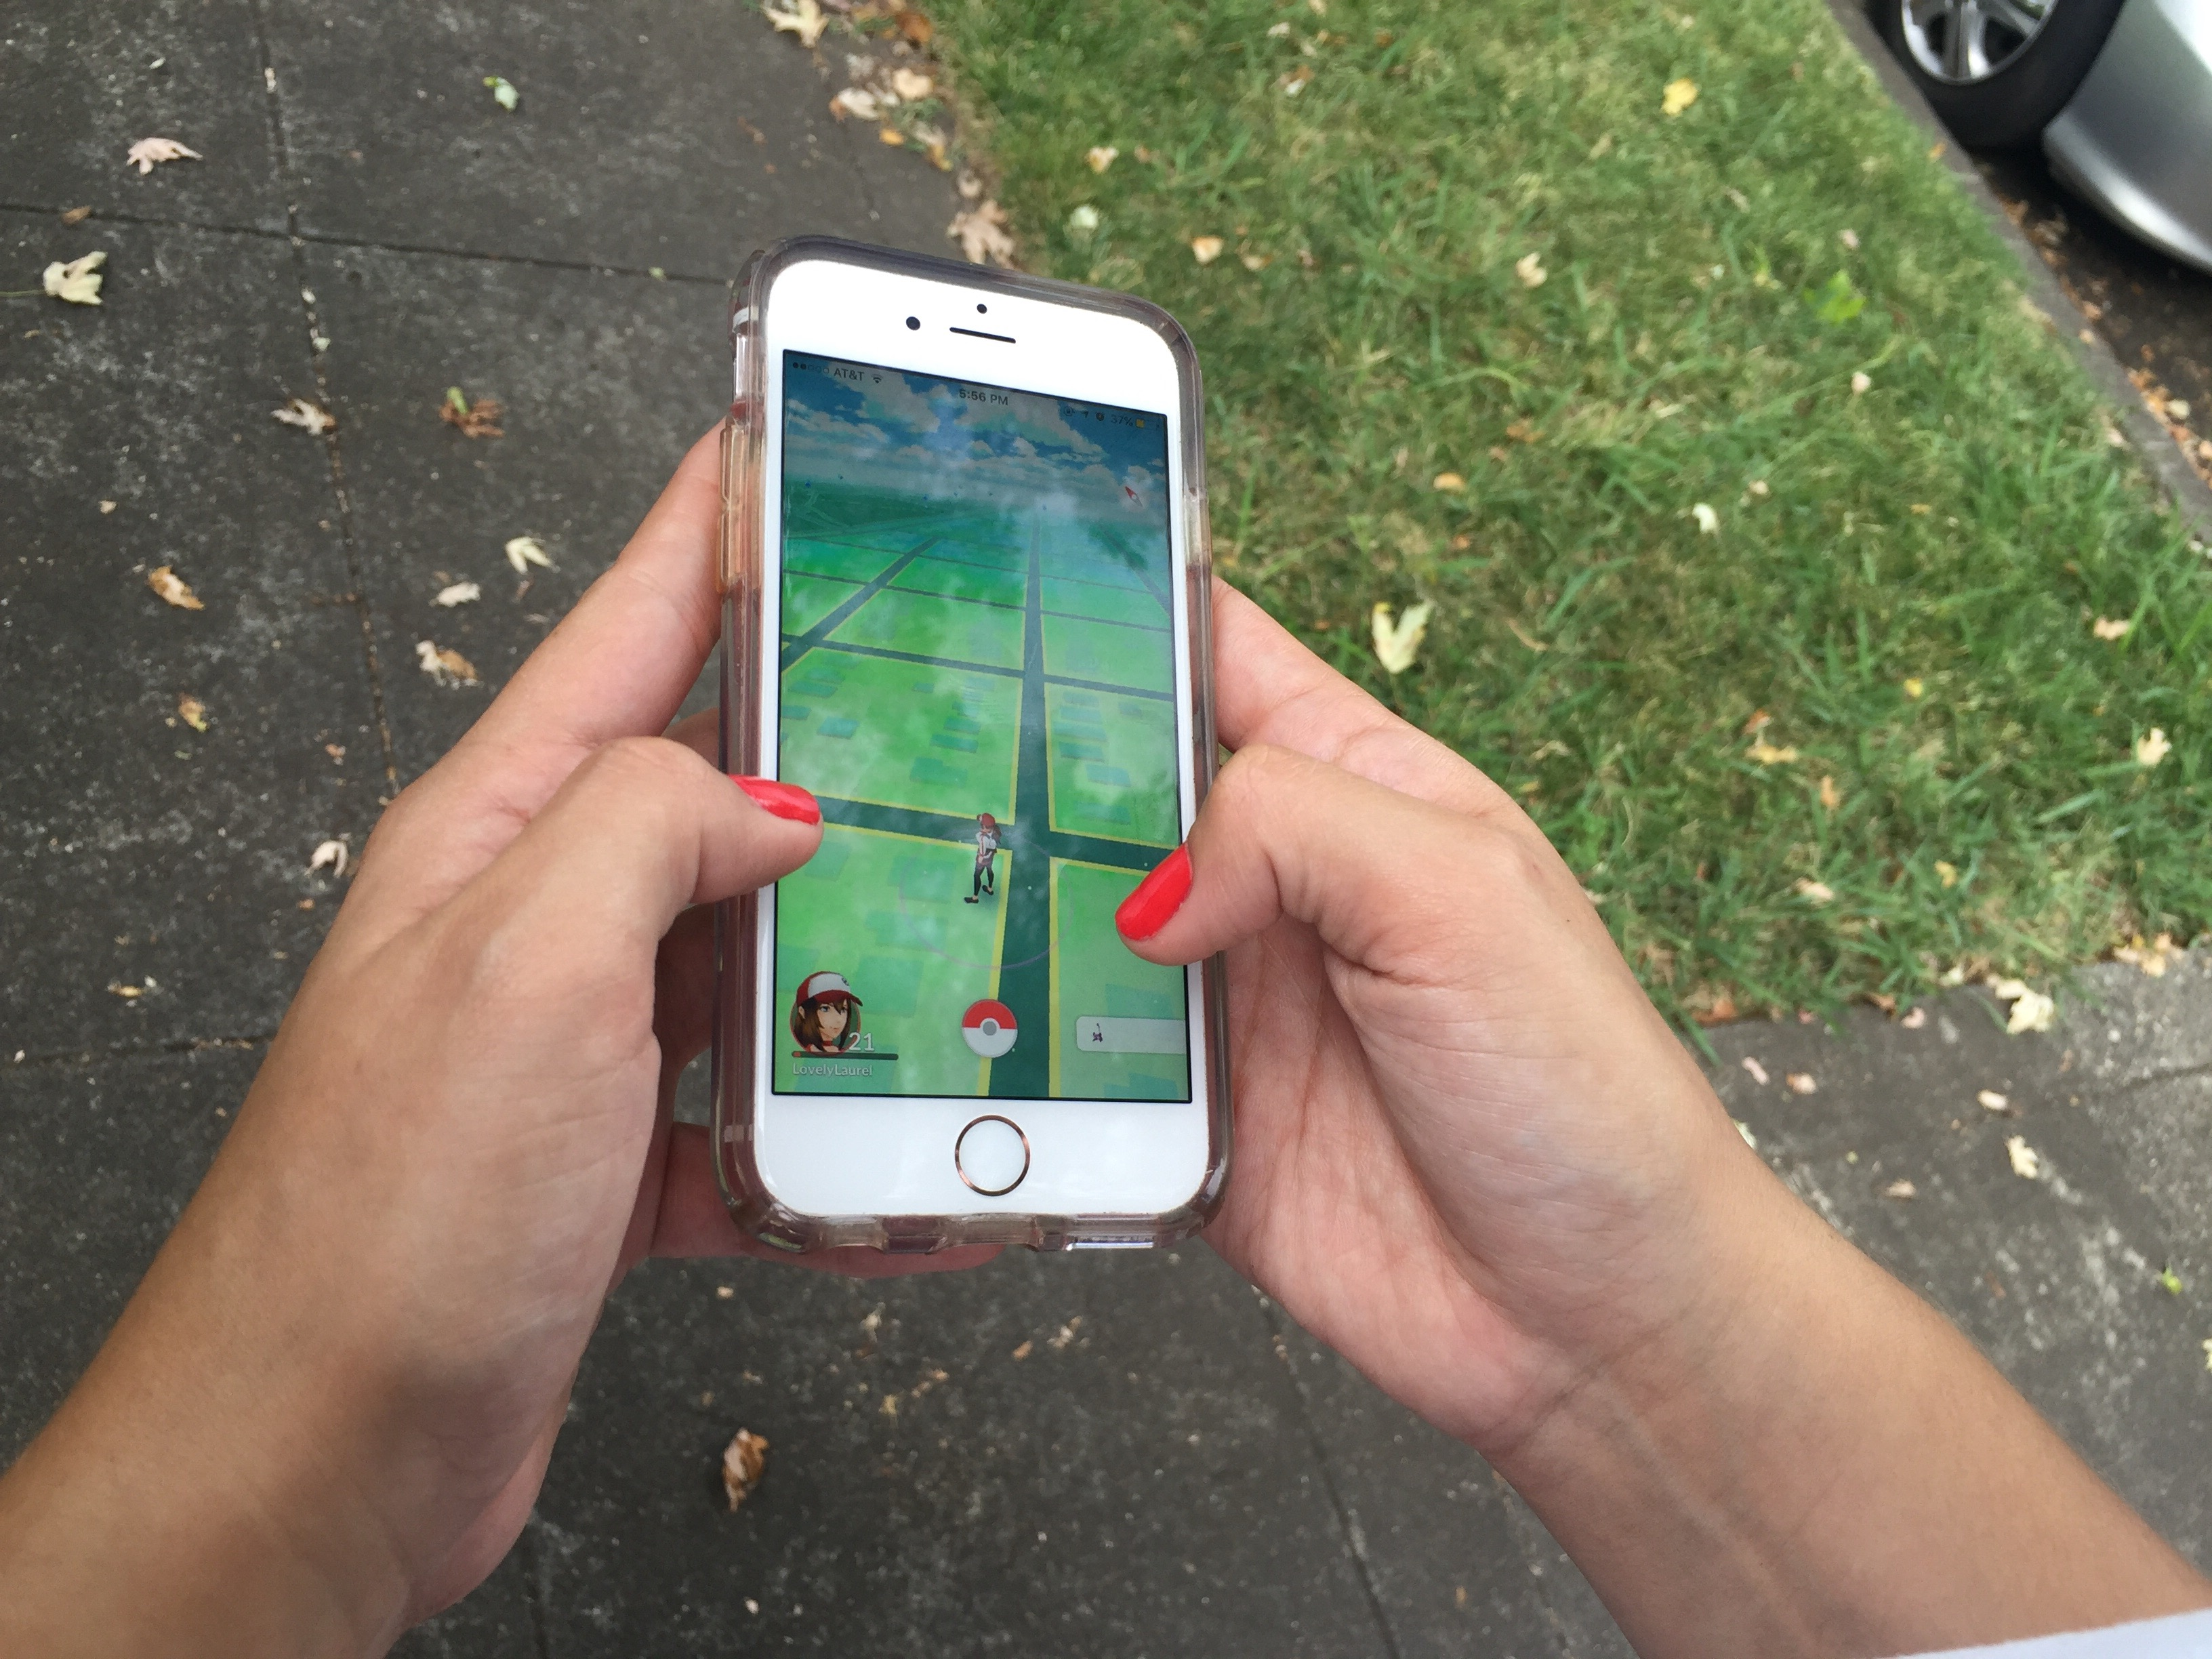 Pokémon GO tracking the tracker